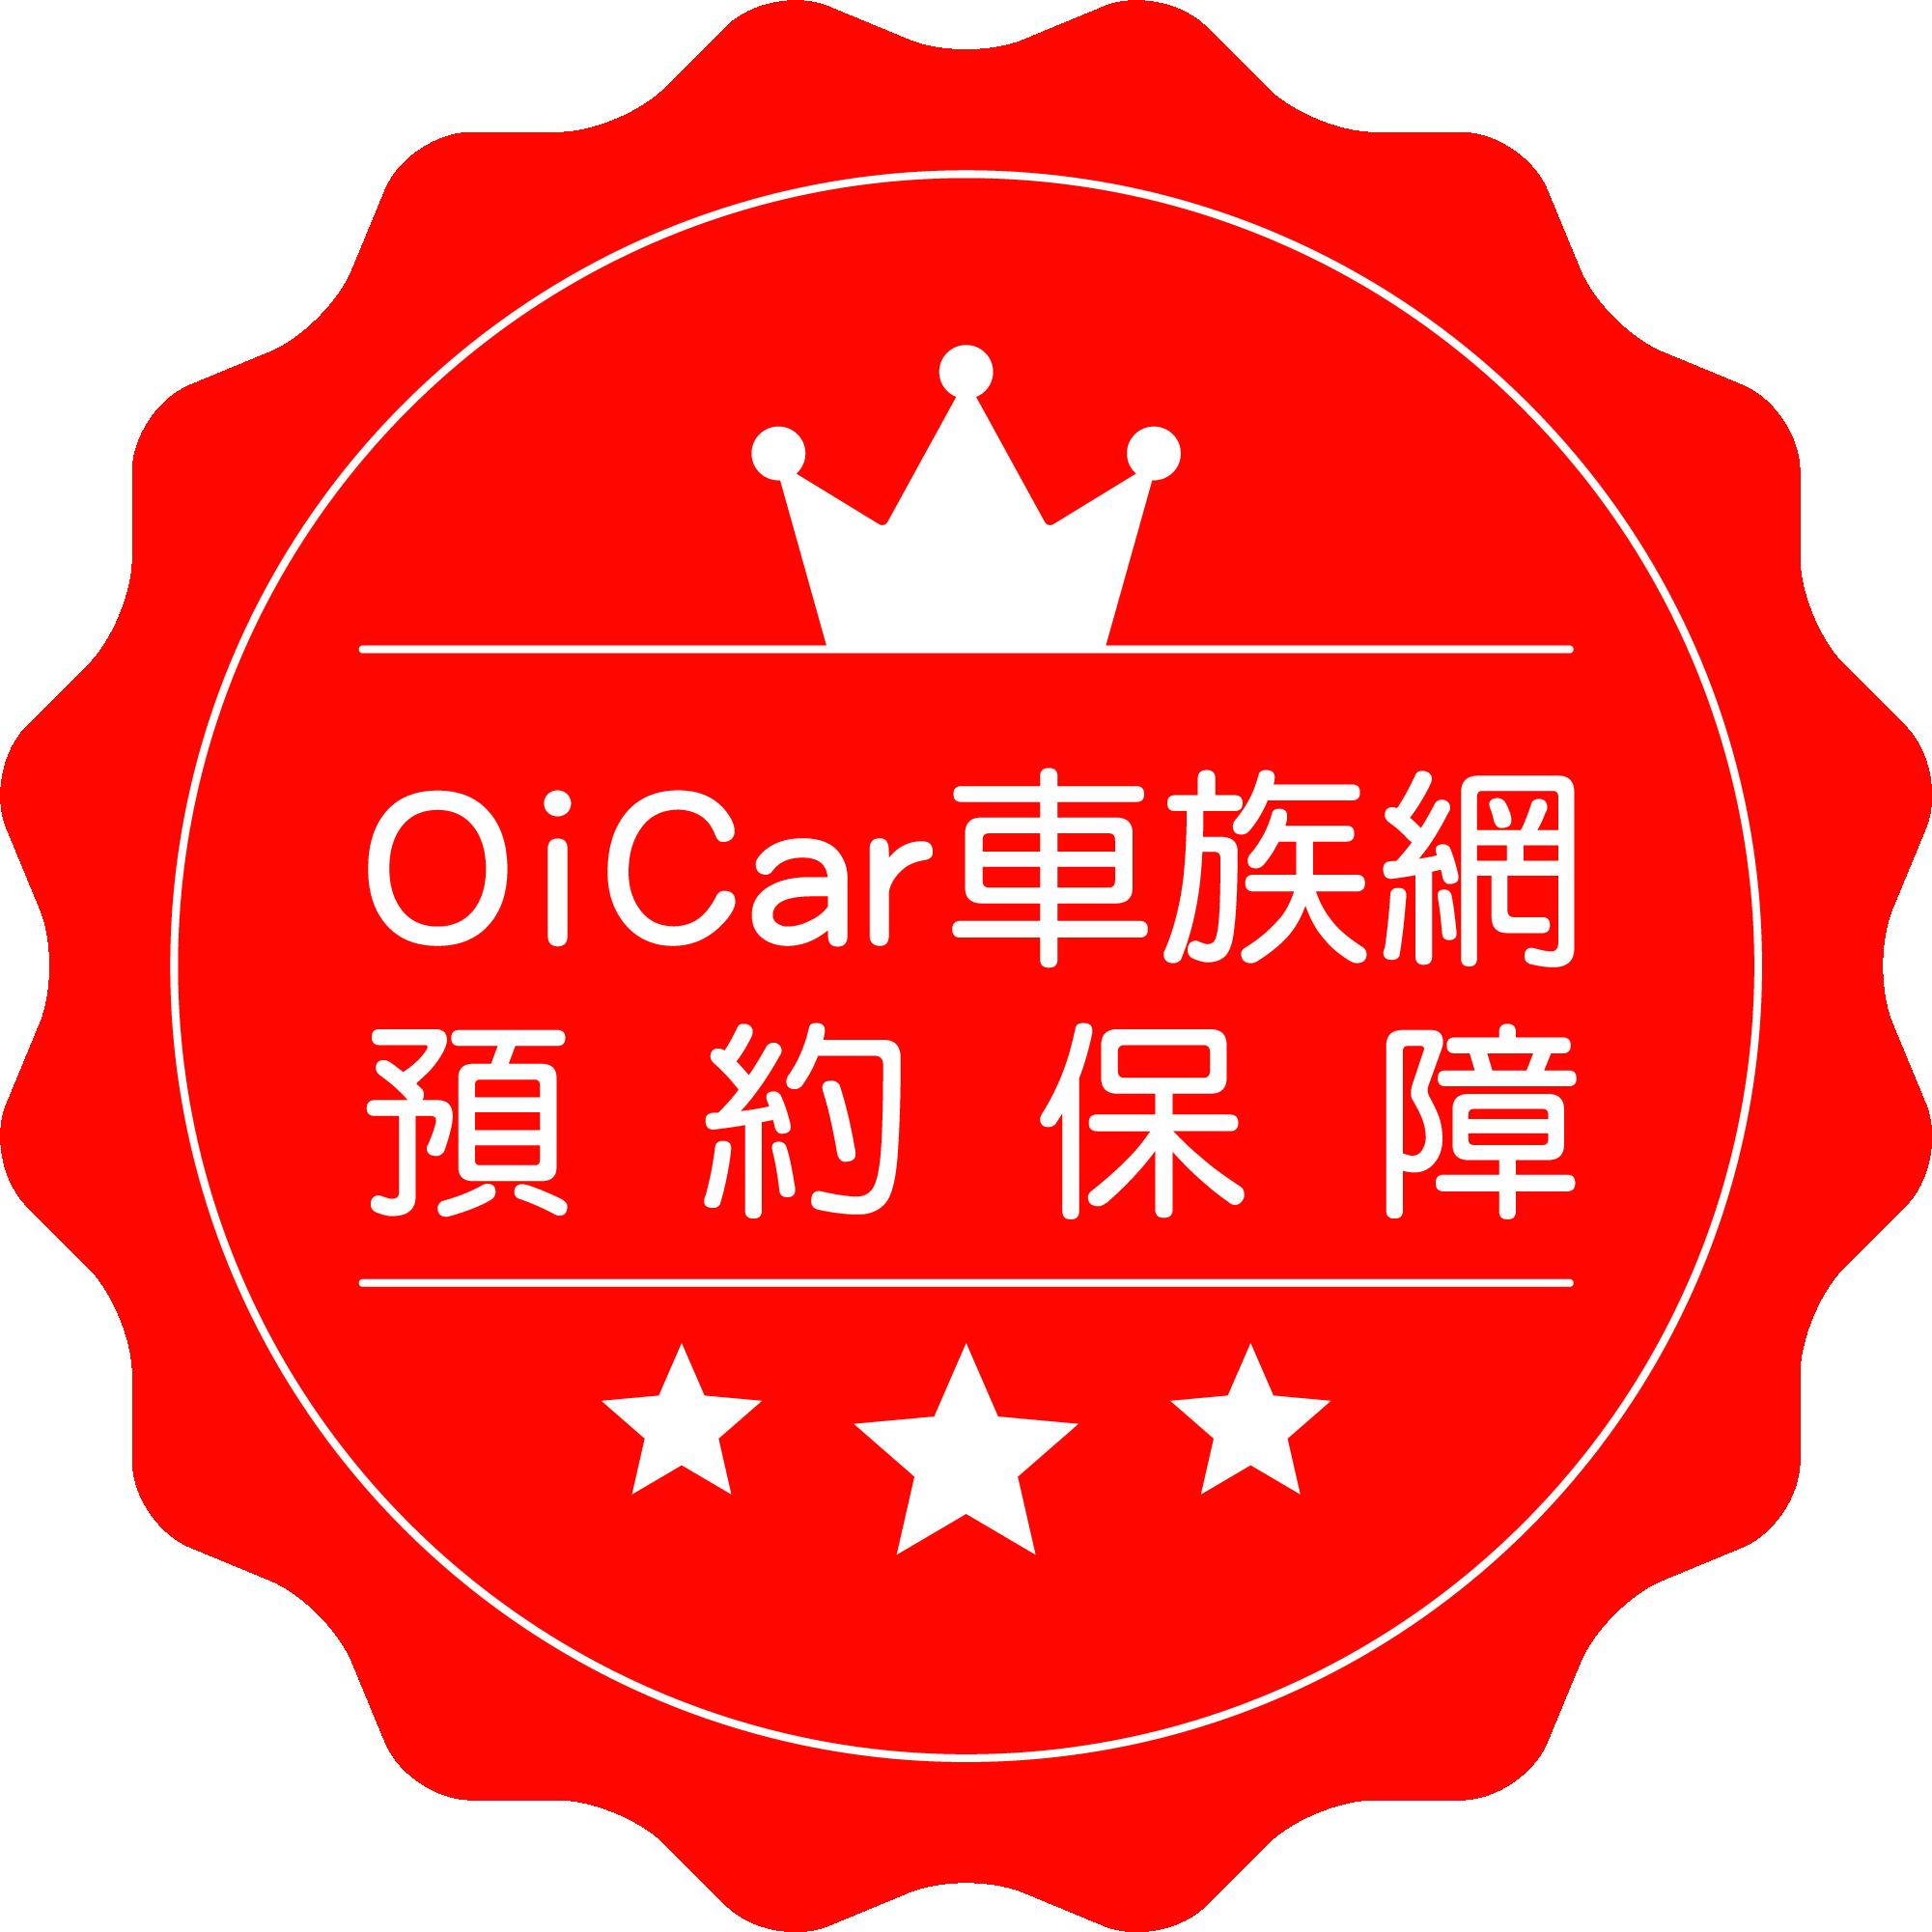 OiCar車族網預約保障